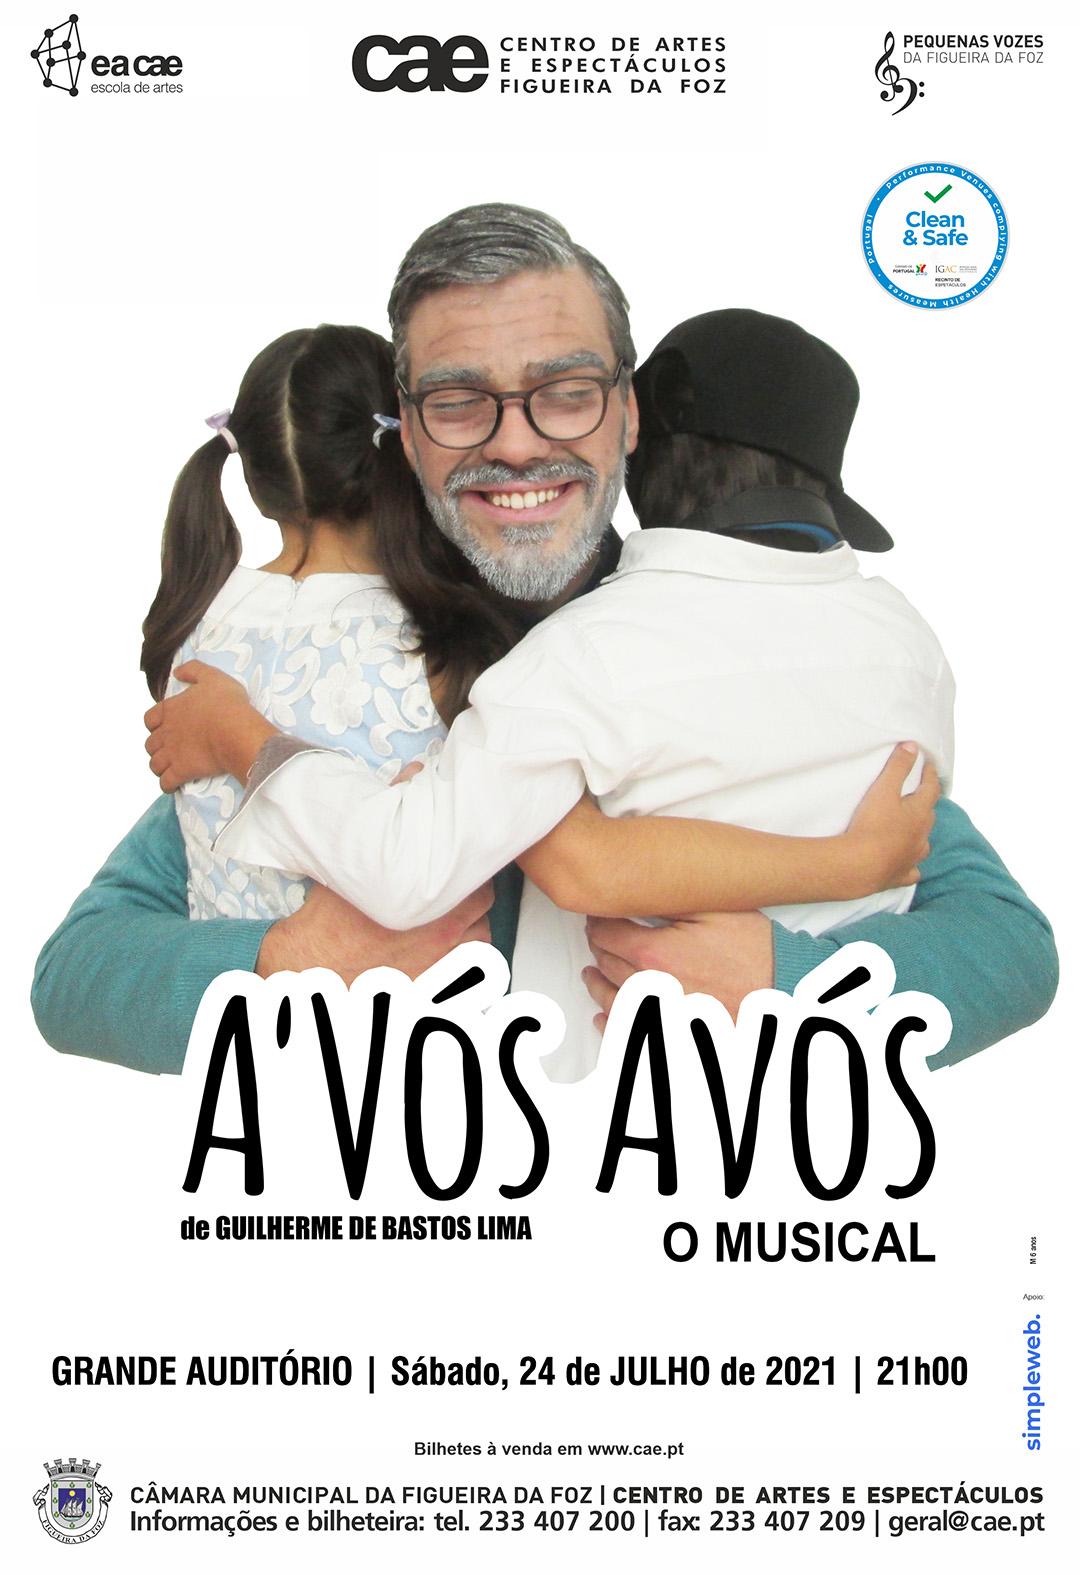 A'Vós Avós - O Musical